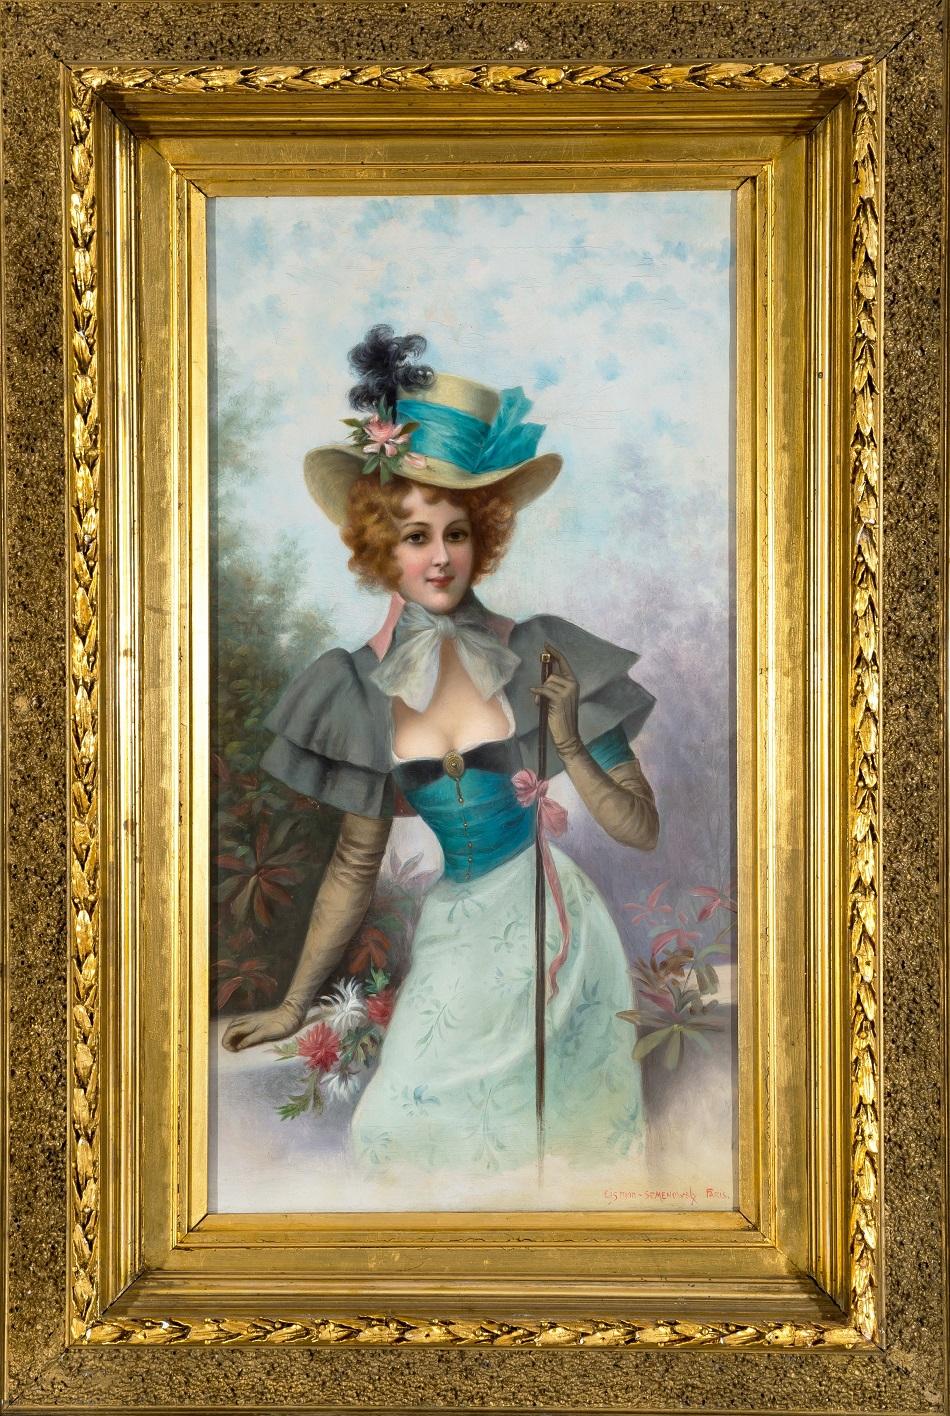 EMILE EISMAN-SEMENOWSKY (POLISH-FRENCH 1857-1911)The Dandizette.jpg